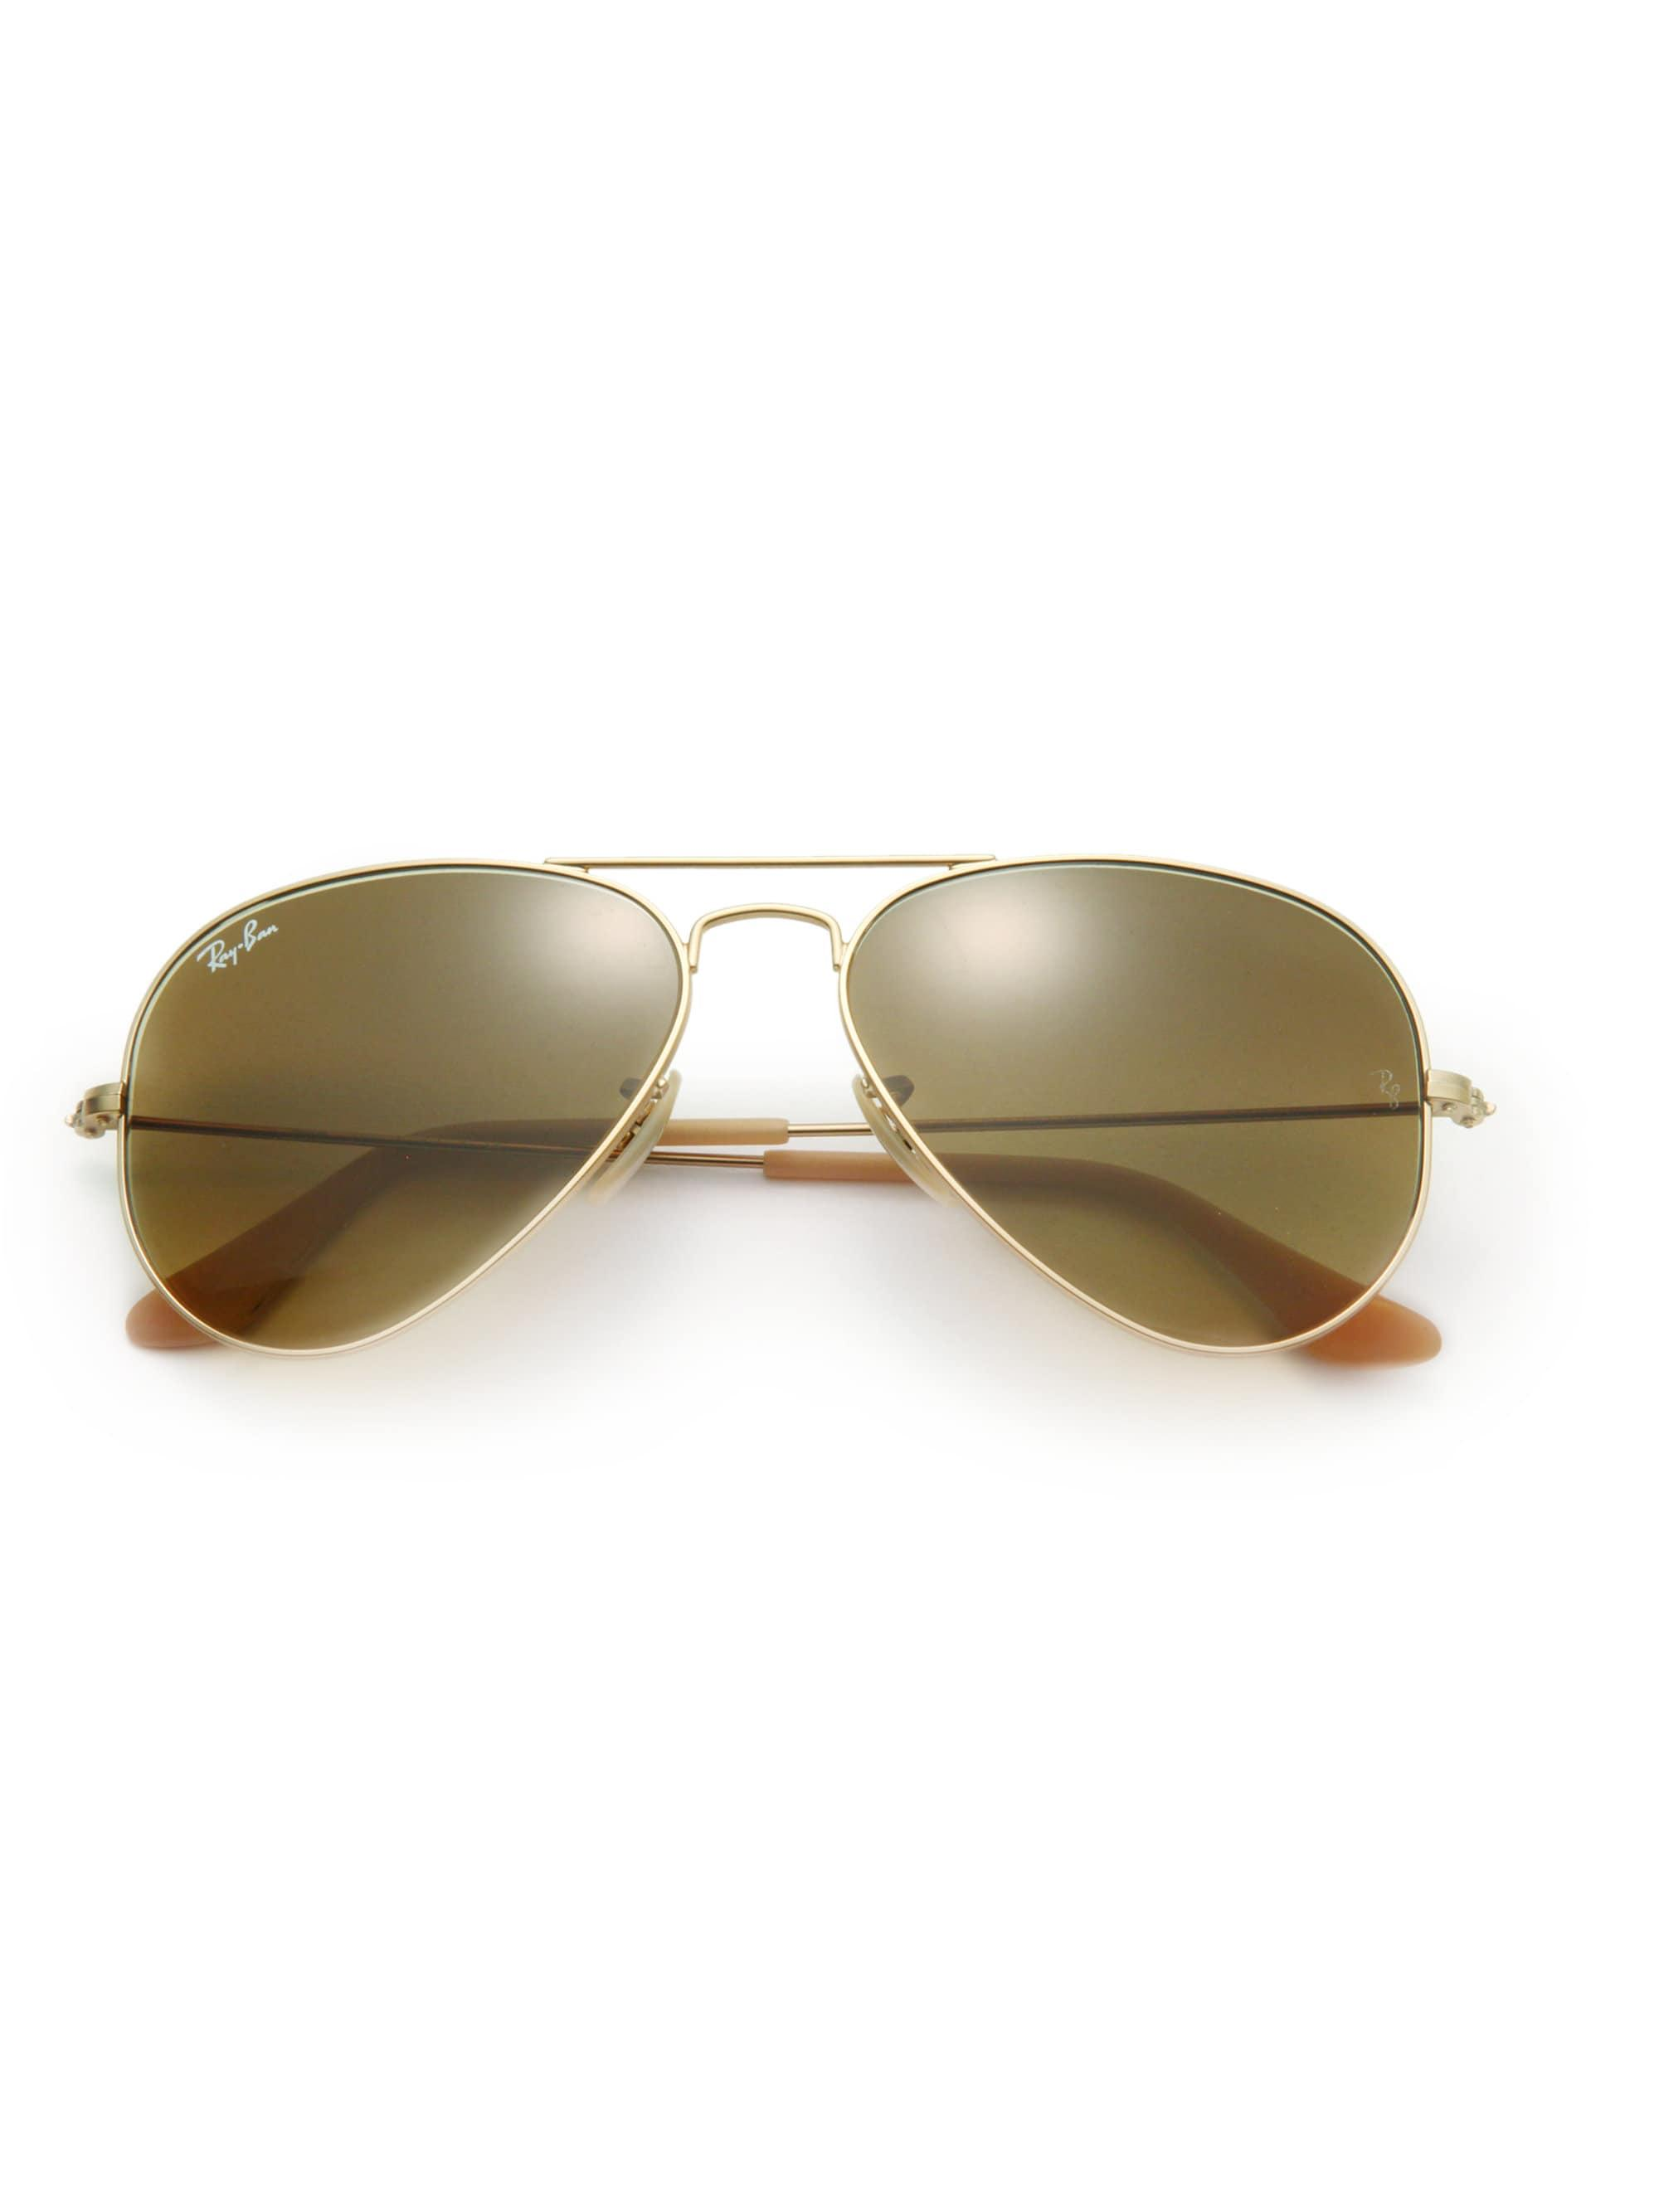 Lyst - Ray-Ban Women s 58mm Original Aviator Sunglasses - Light Gold ... 9fb37a320